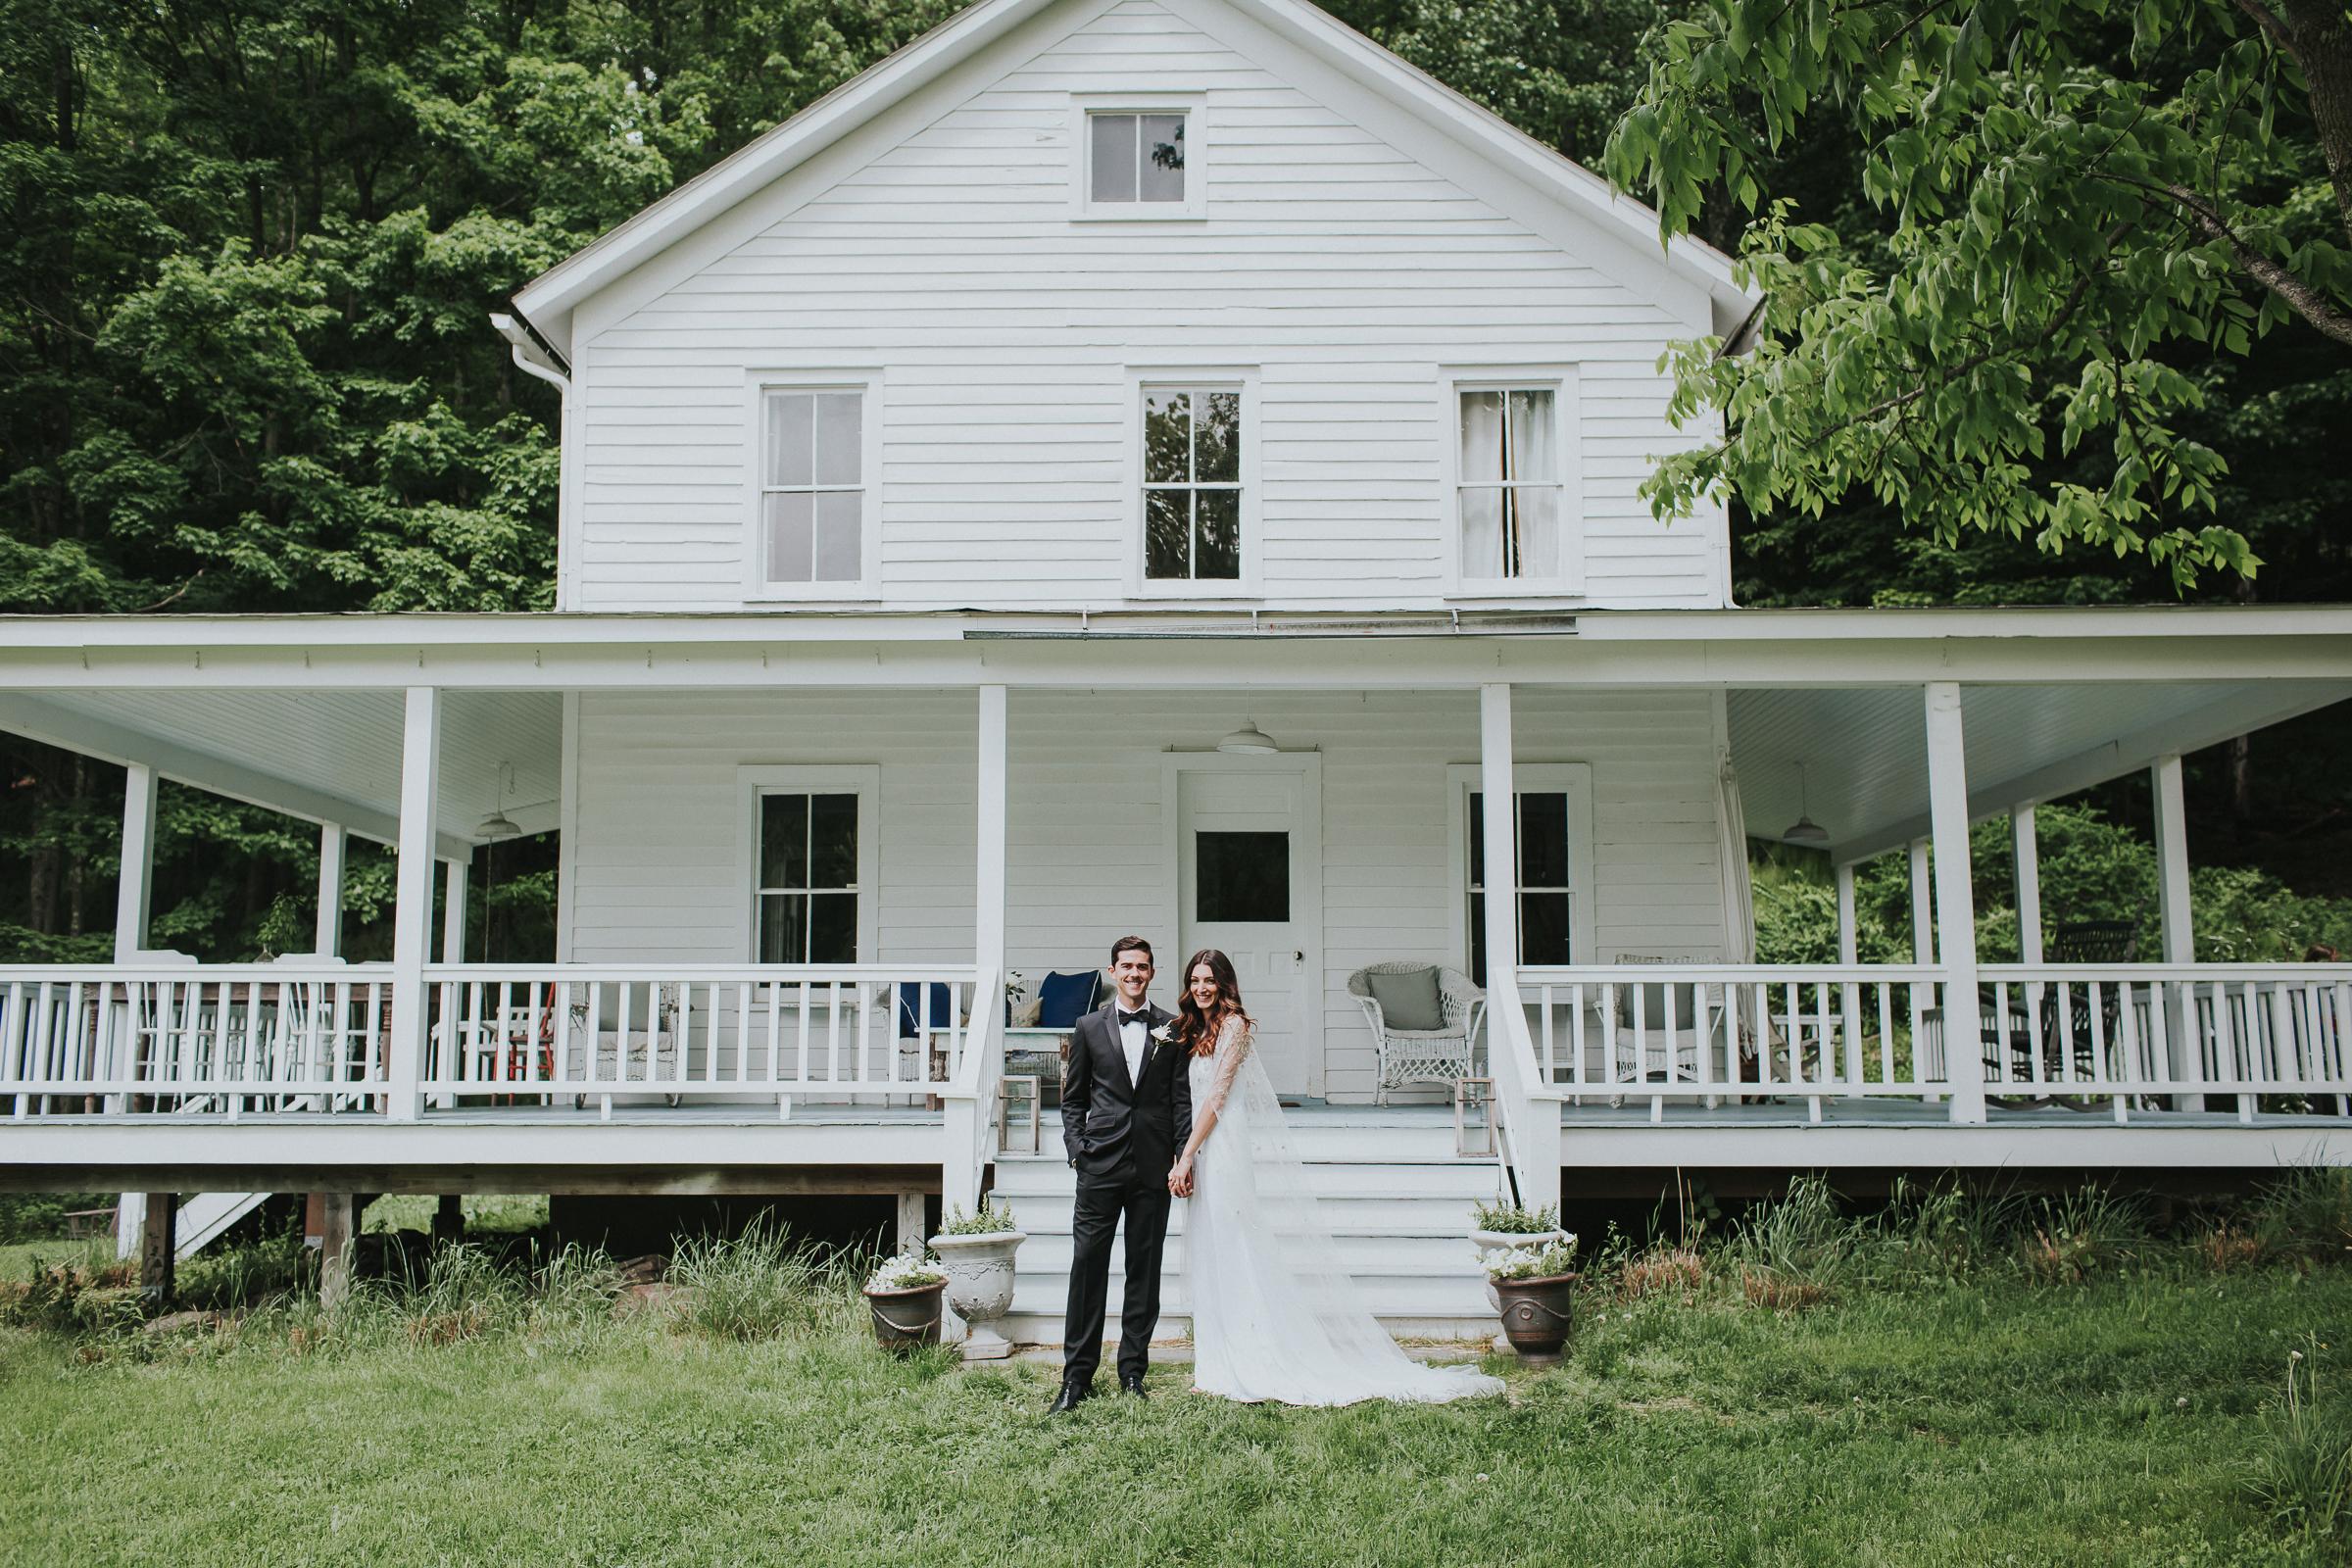 Handsome-Hollow-Long-Eddy-Catskills-New-York-Fine-Art-Documentary-Wedding-Photographer-32.jpg